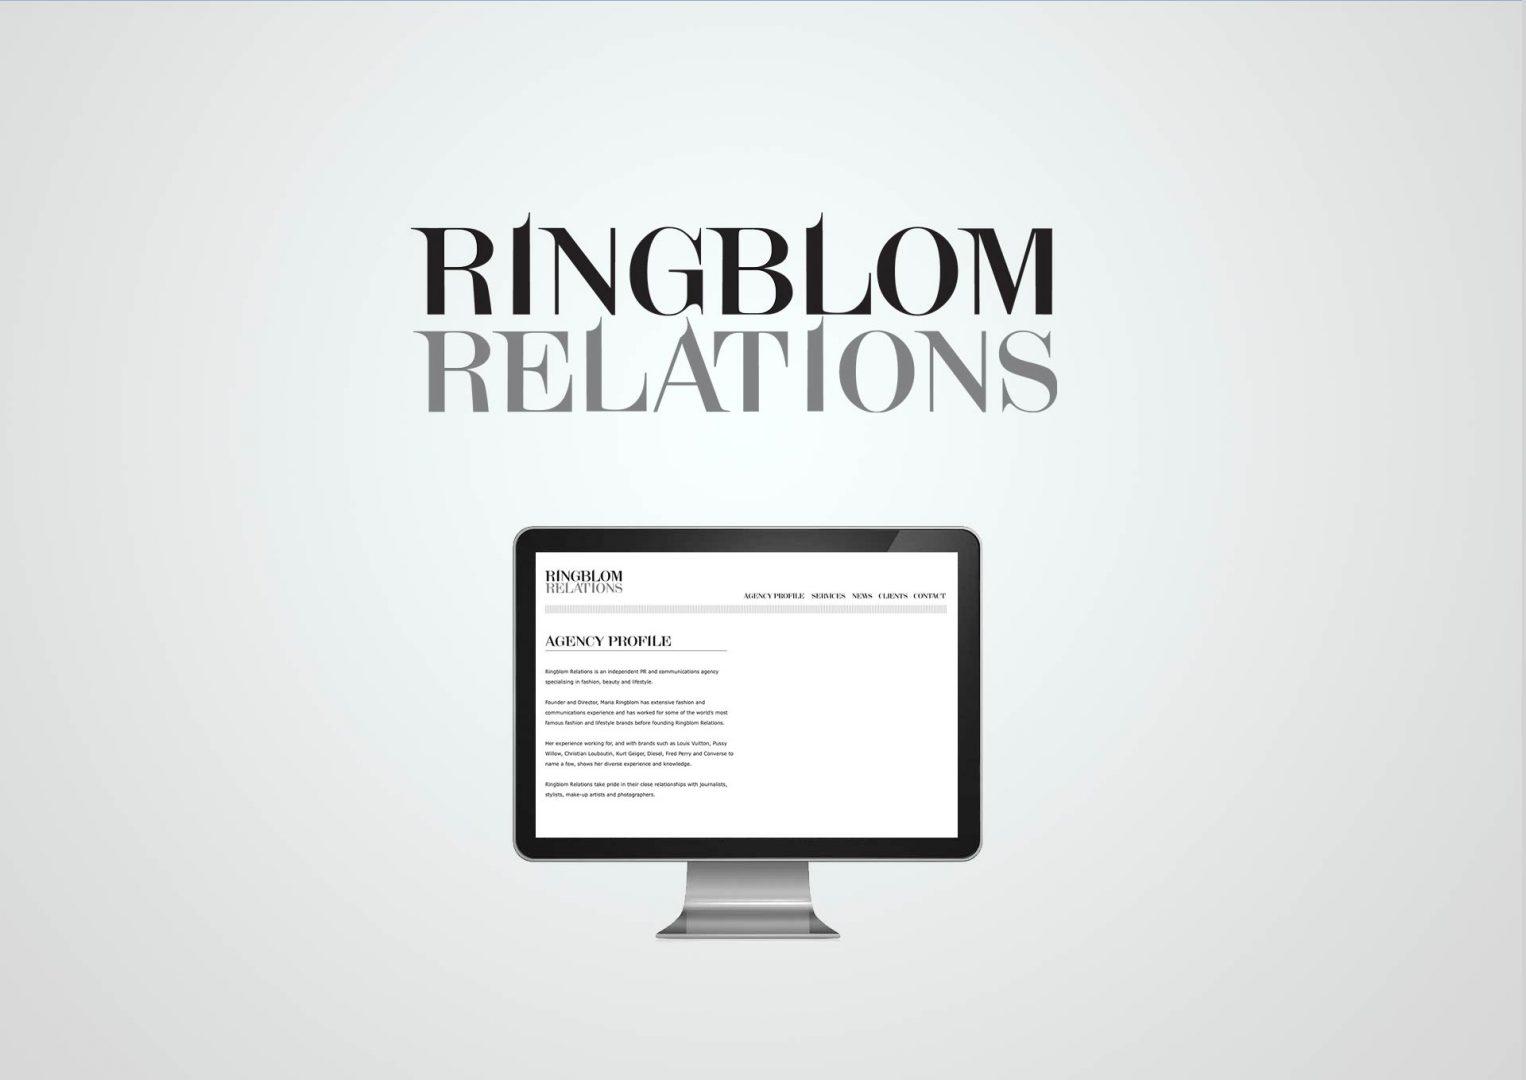 Ringblom Relations, Logo design, Graphic Designer, Photoshop, Branding, Romford, Essex, Jan Lewis Creative